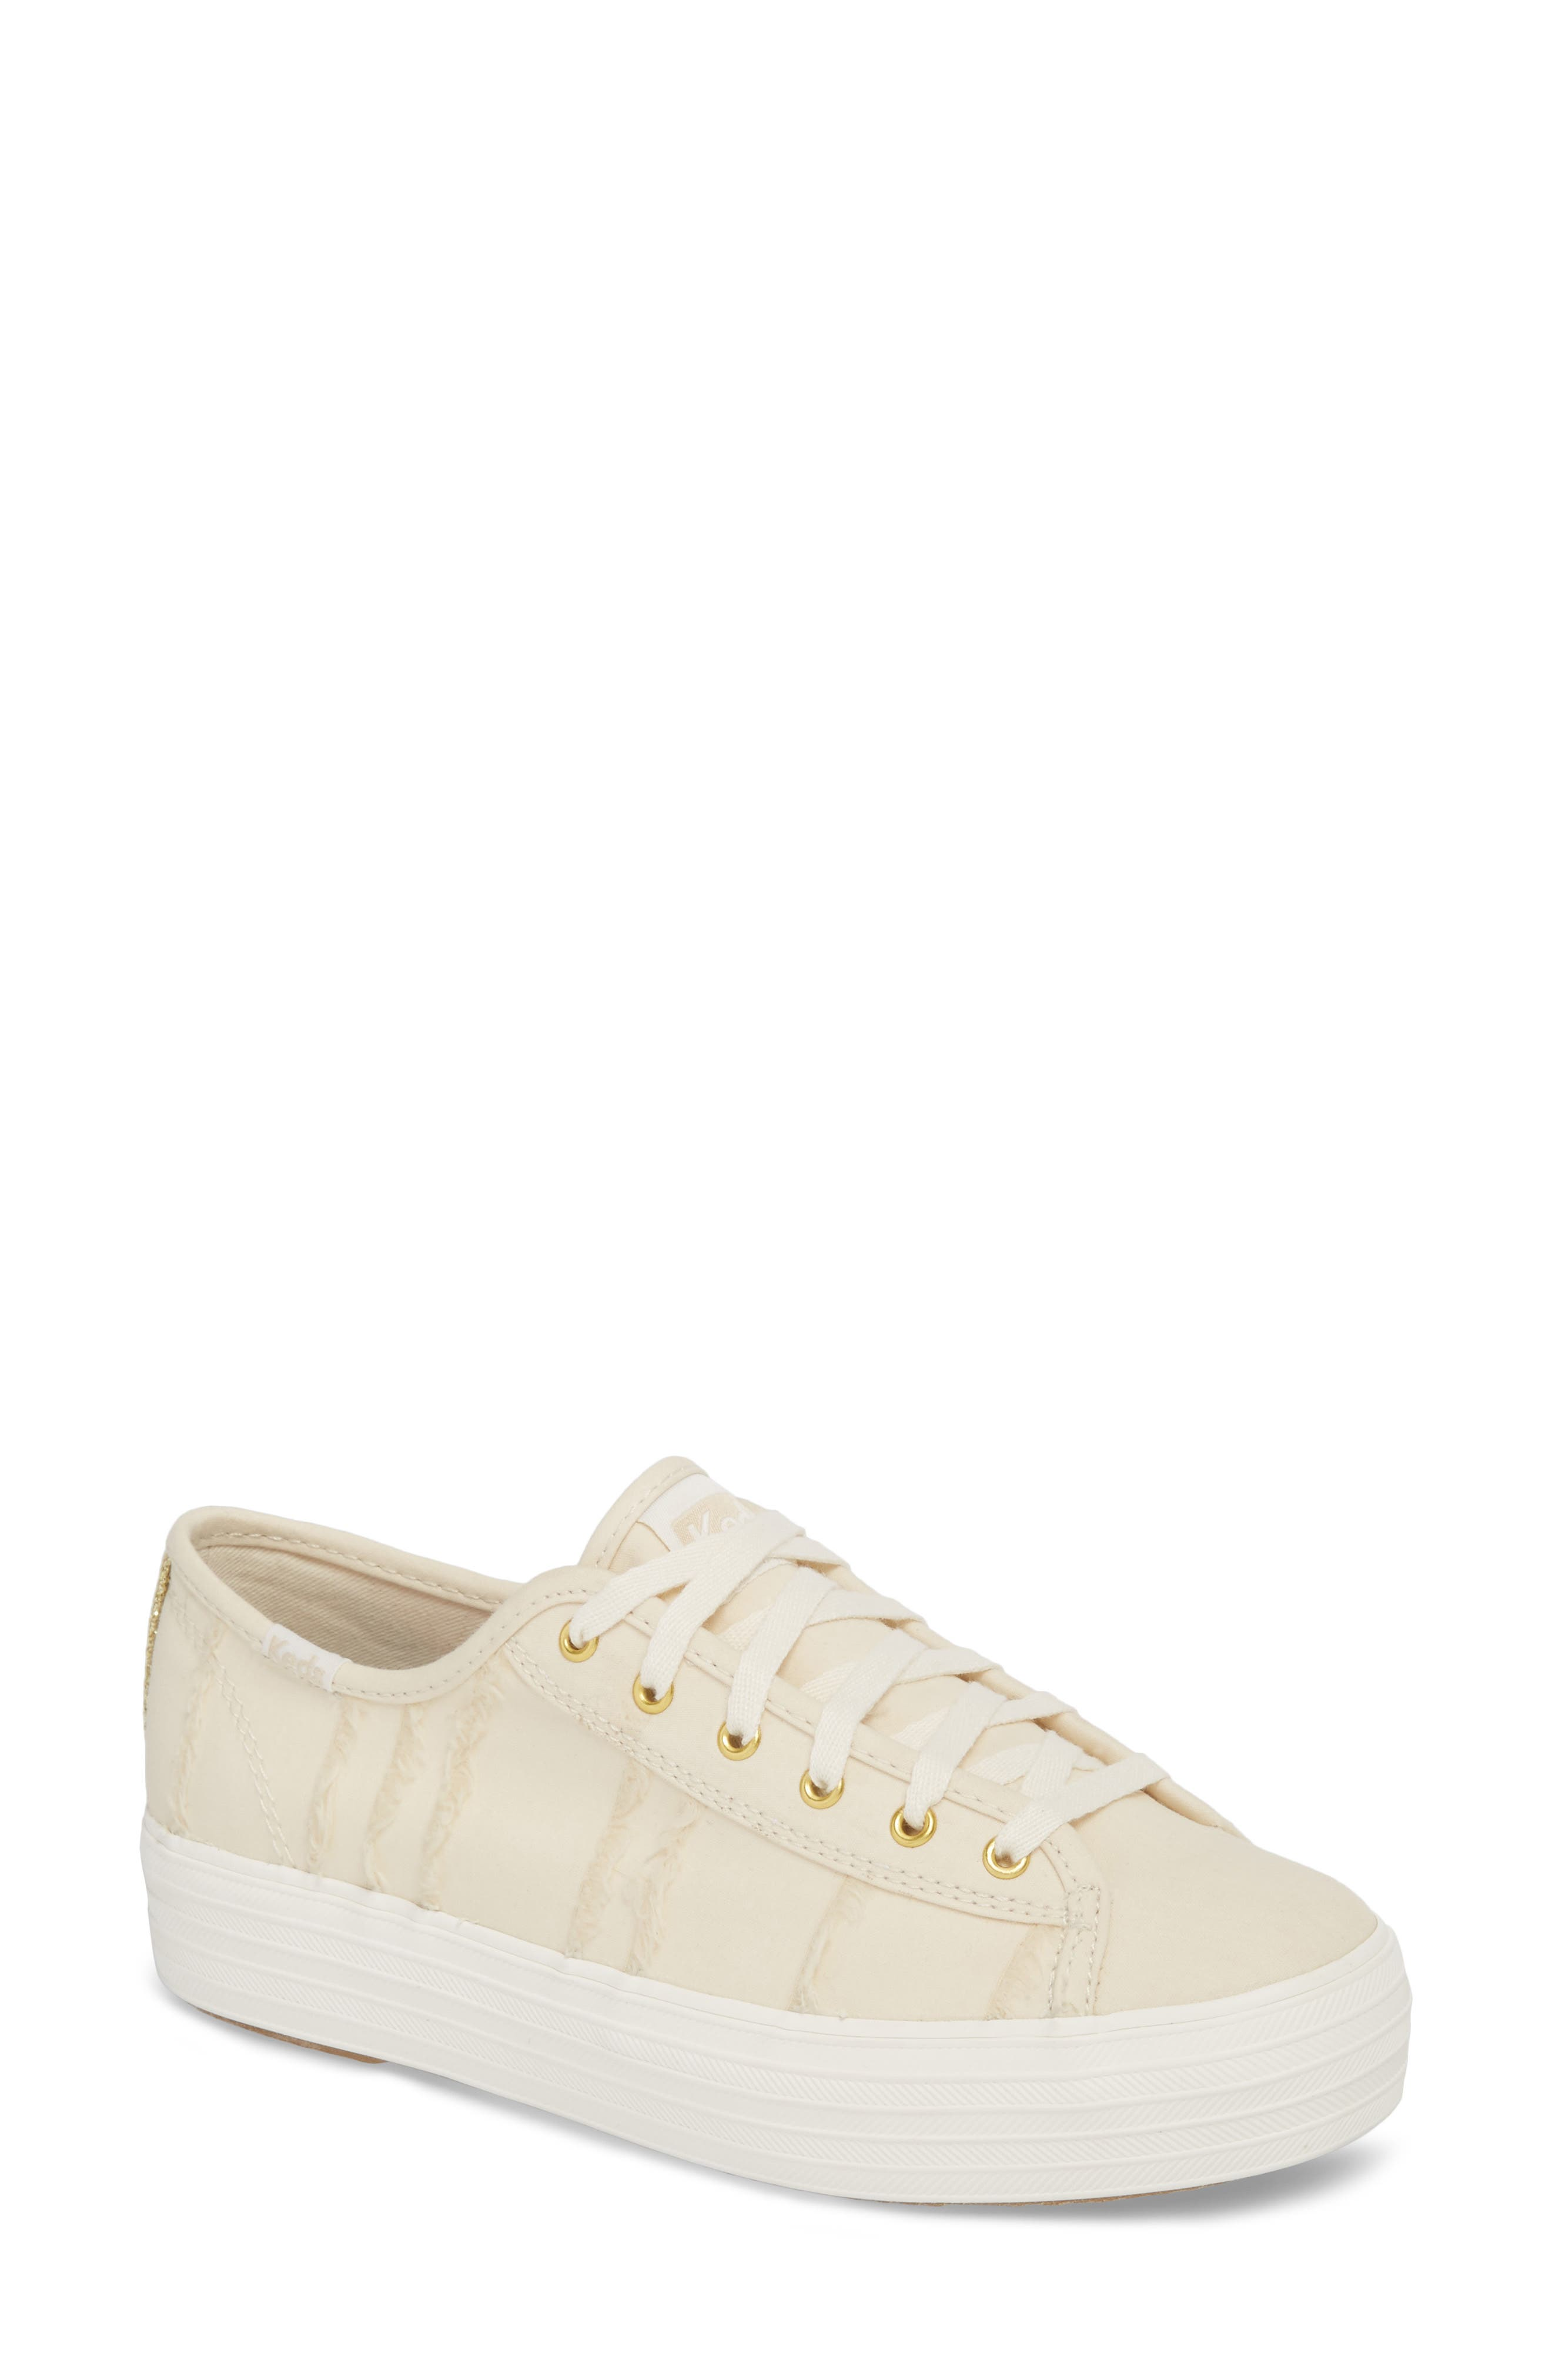 Triple Kick Canvas Sneaker,                             Main thumbnail 1, color,                             Cream